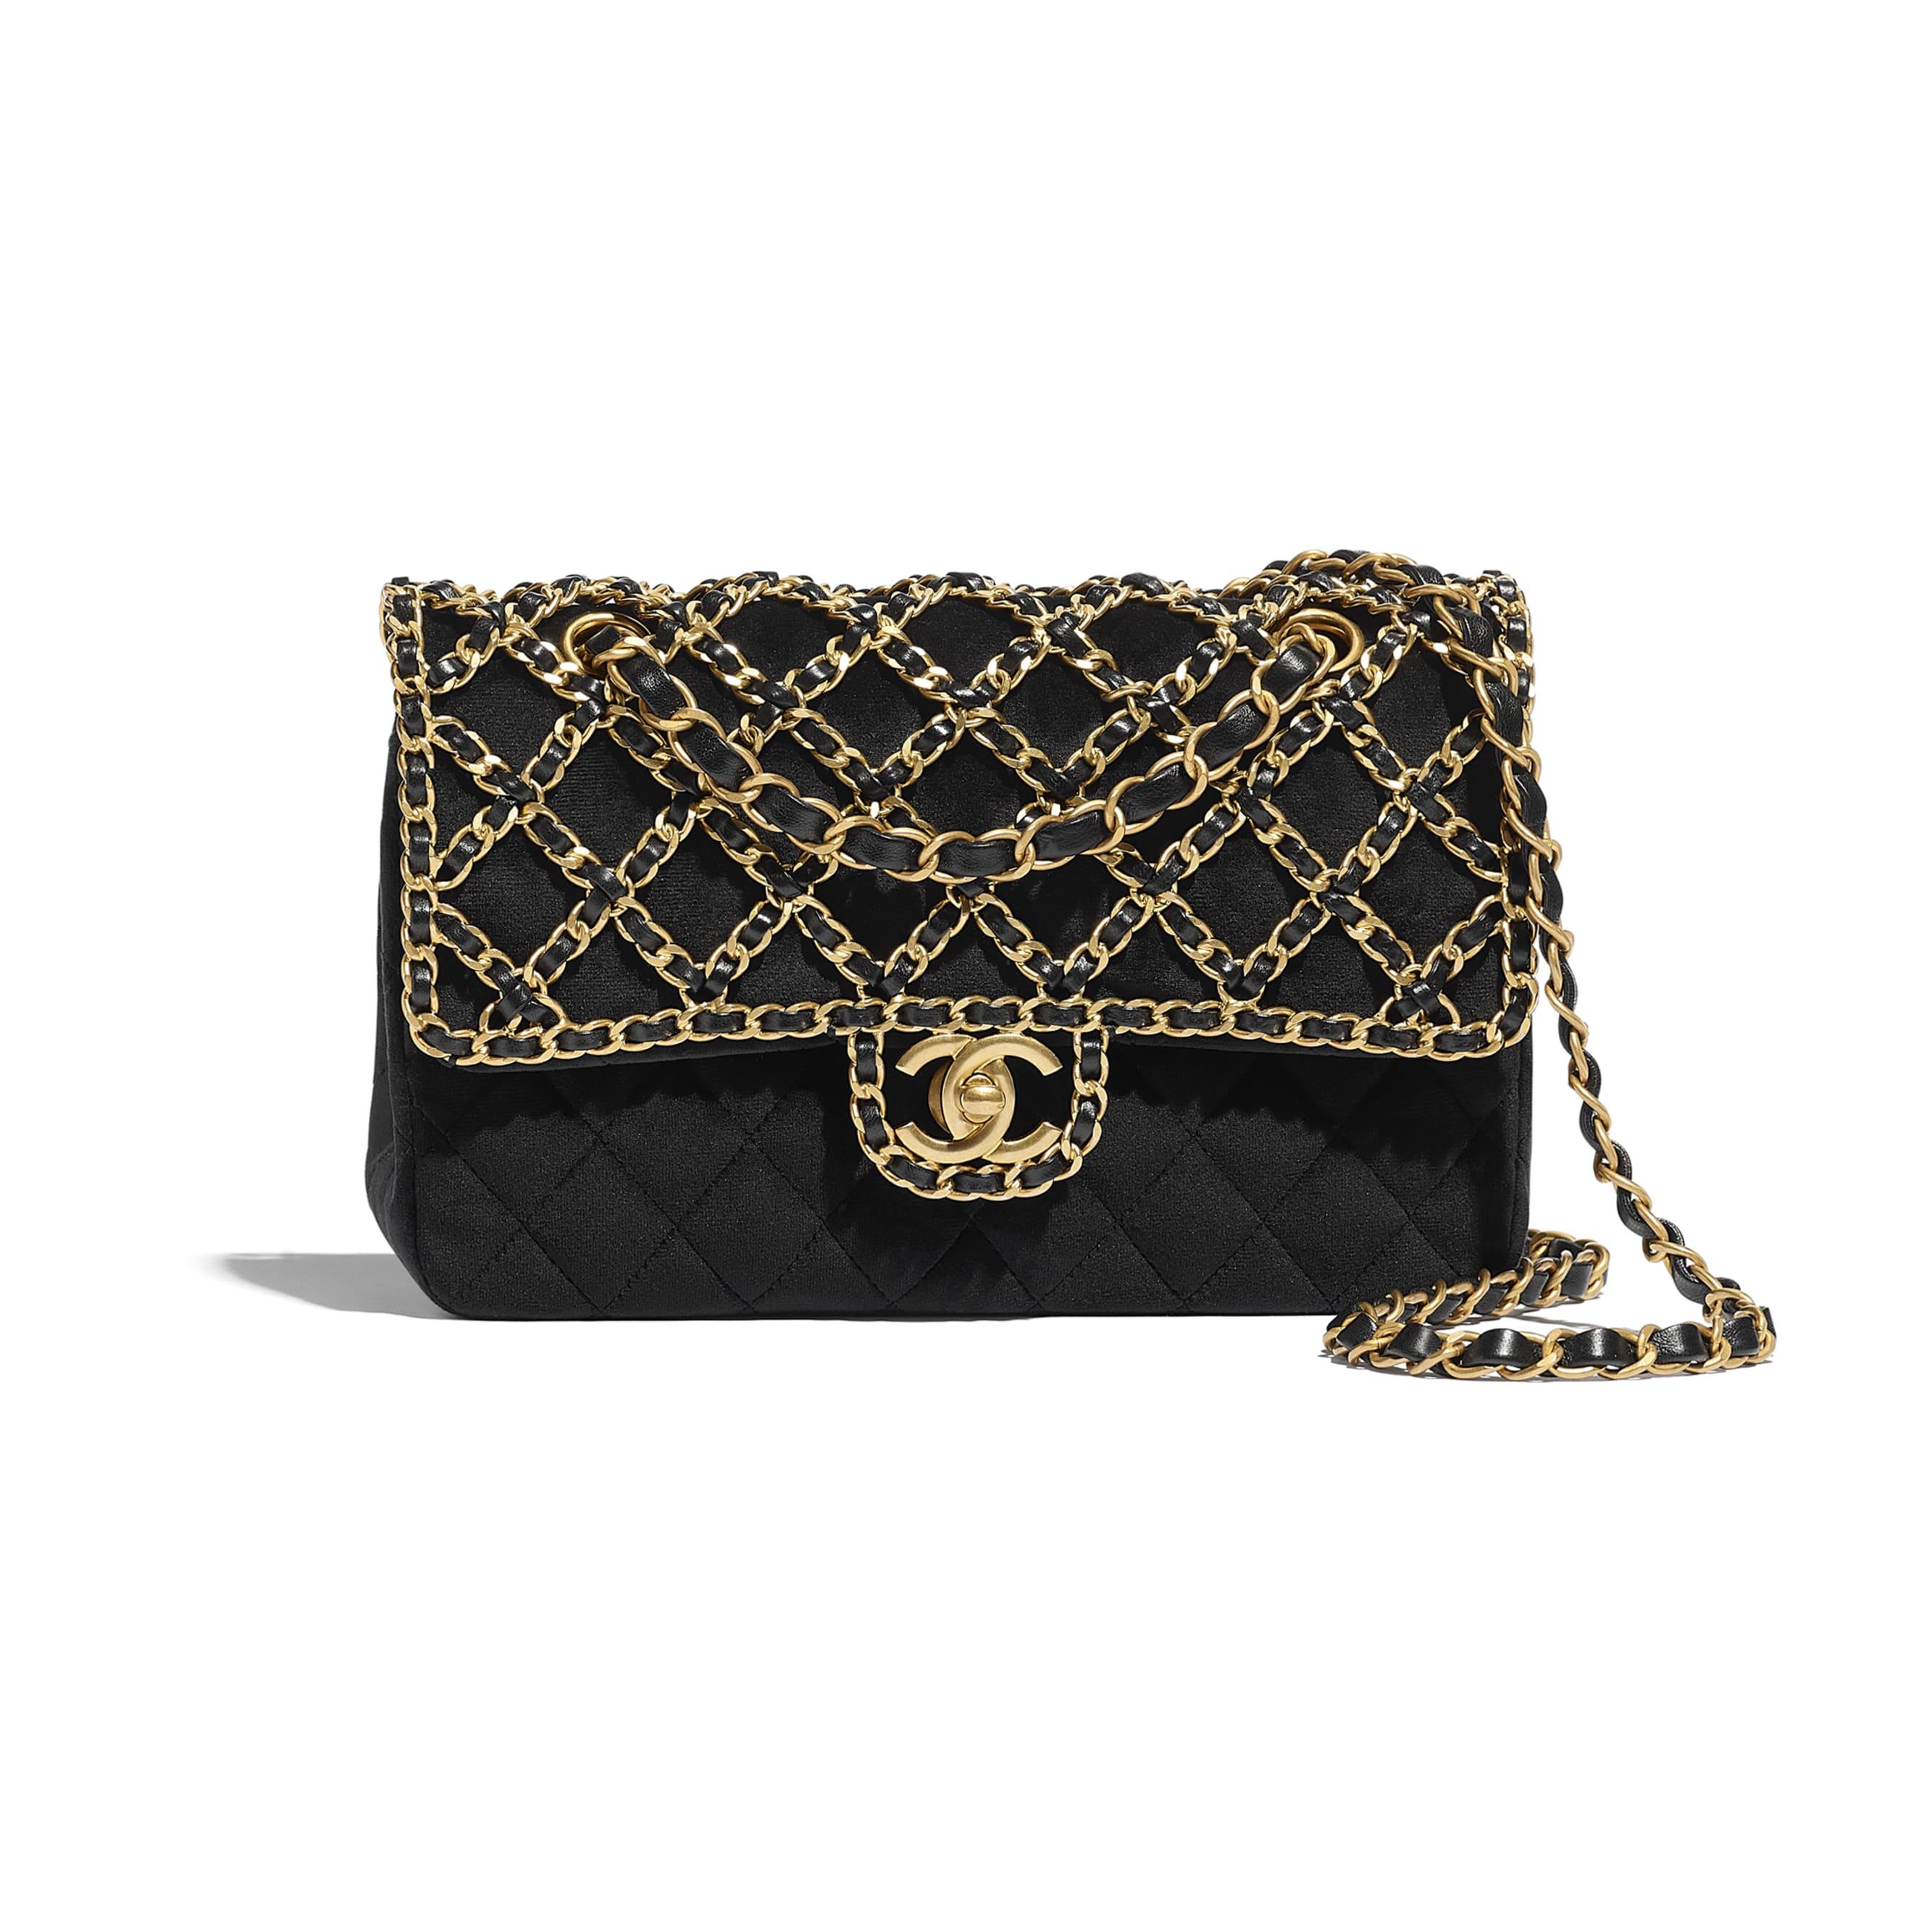 Classic Handbag - Black - Velvet & Gold Metal - CHANEL - Default view - see standard sized version